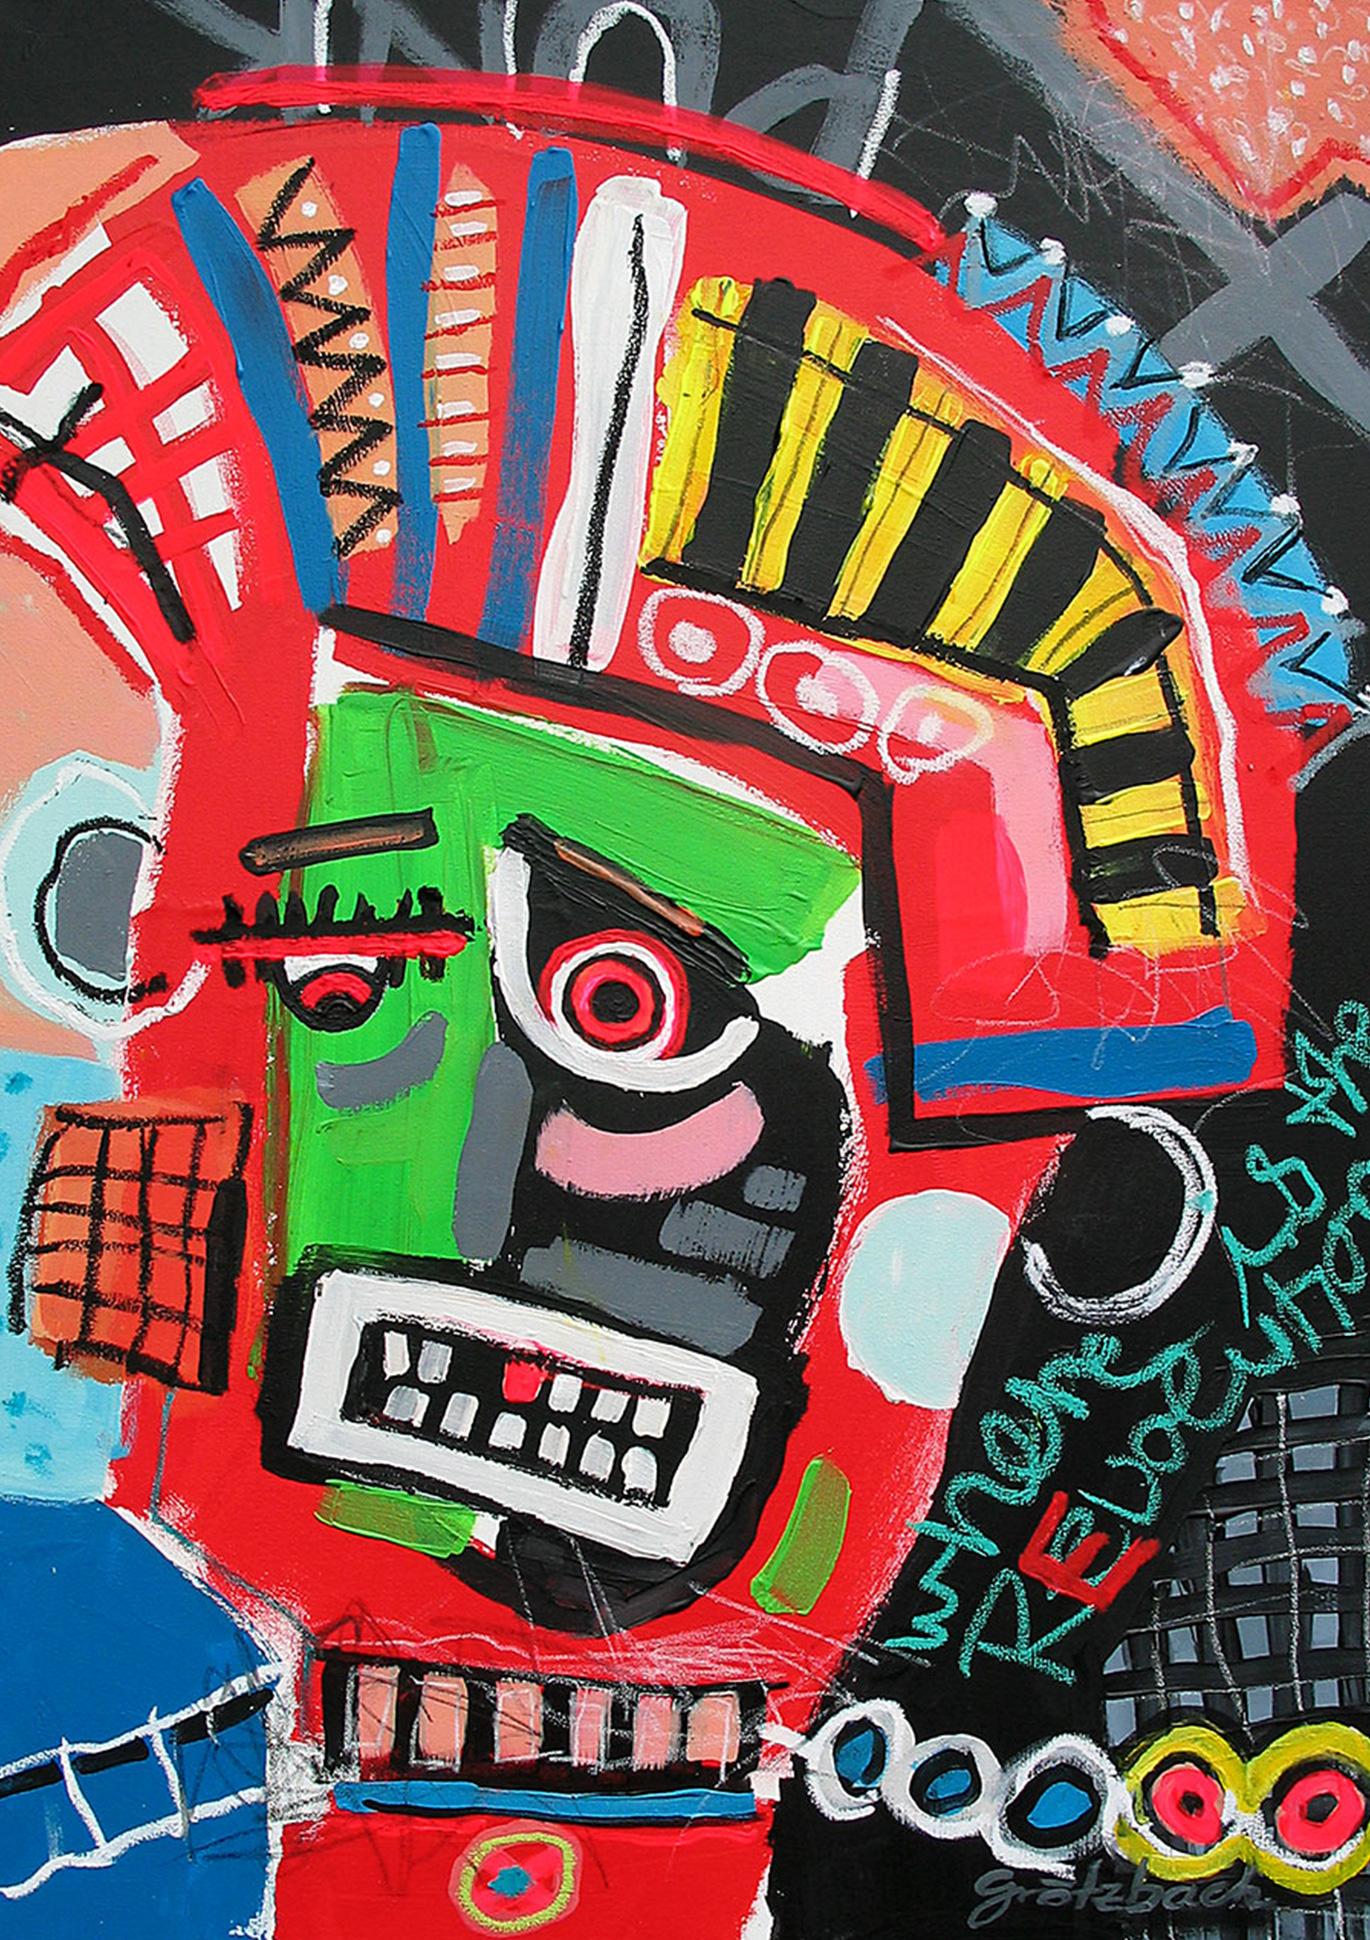 Grötzbach, sabine grötzbach, groetzbach, sgroetzbach, UV, Blacklight, Blacklight-art, Blacklightart, ultraviolett, ultra violett, ultra-violett, uv-kunst, moderne kunst, modern art, expressionismus, 76356 Weingarten, 76356, Karlsruhe, Kunst, Kunst Karlsruhe, Ausstellung, Art, Art Karlsruhe, art-karlsruhe, Künstler karlsruhe, Baden-Baden, Kunstverein baden-Baden, Badischer Kunstverein, schwarzlicht, schwarzlicht-kunst, schwarzlichtkunst, kunstschule Bruchsal, Muks, Kugel, kugel linkenheim, 12 plus, 12+, künstlergruppe, Skulptur, Skulpturen, Holzskulpturen, Kettensägenkunst, Carving, schnitzen, holzschnitzerei, schnitzen, schnitzerei, Tod, Wiedergeburt, Auferstehung, bibel, bibel kunst, religion kunst, politische kunst, exhibition, Ausstellung, Ausstellung durlach, durlach-art, Ausstellung Karlsruhe, Ausstellung Bruchsal, Grötzingen, Künstler grötzingen, künstlerin weingarten, grötzbach weingarten, gallerie kunst